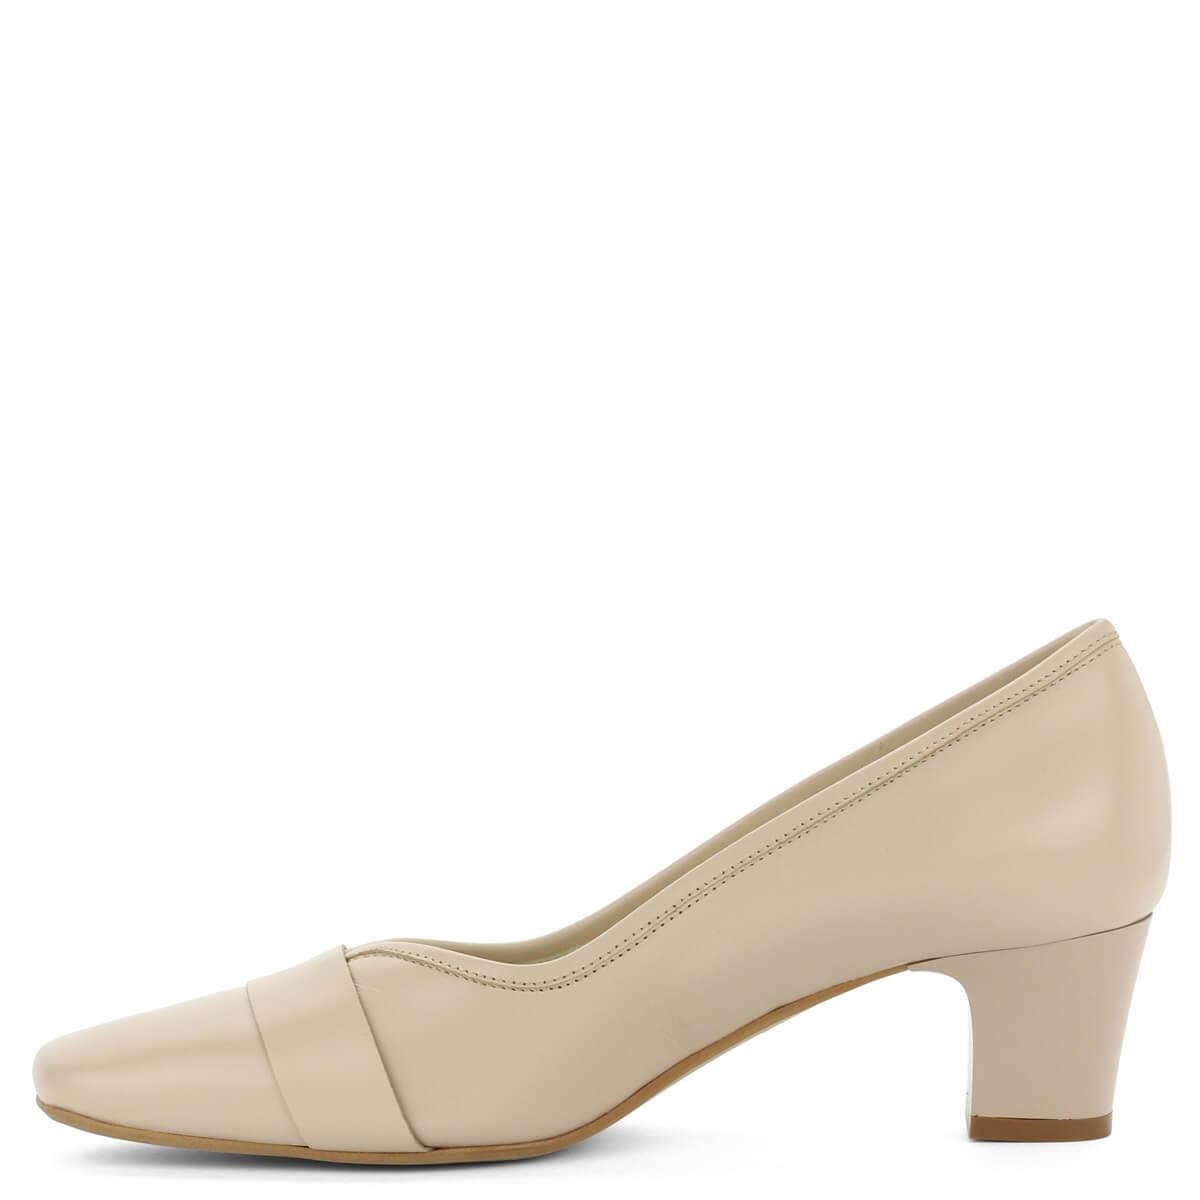 Kis sarkú bézs Anis bőr cipő. Elegáns kocka sarkú női alkalmi cipő. 16629d1283